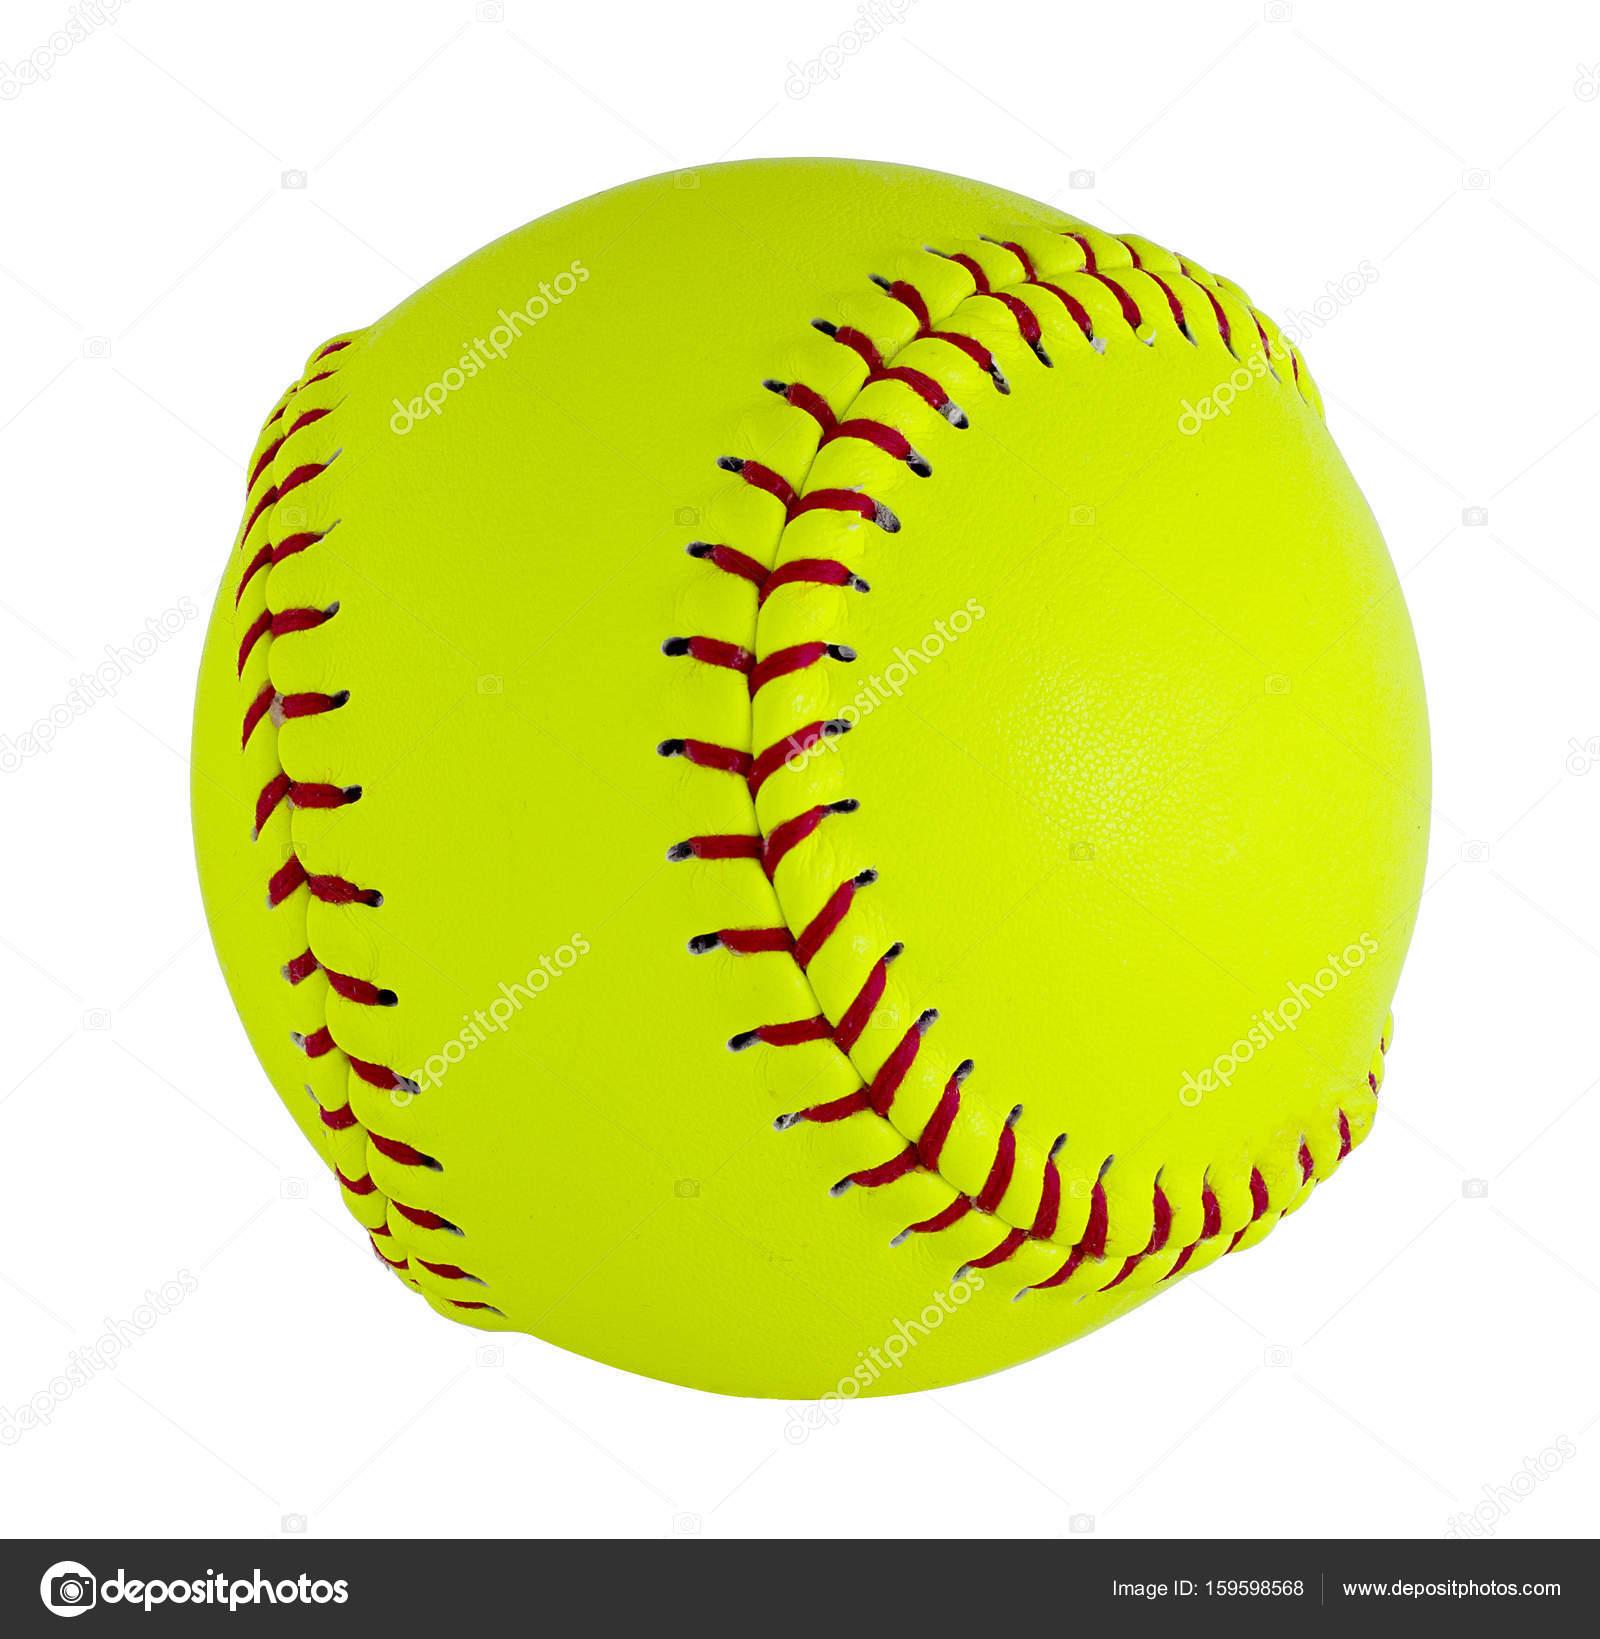 Softball: Softball Background Images